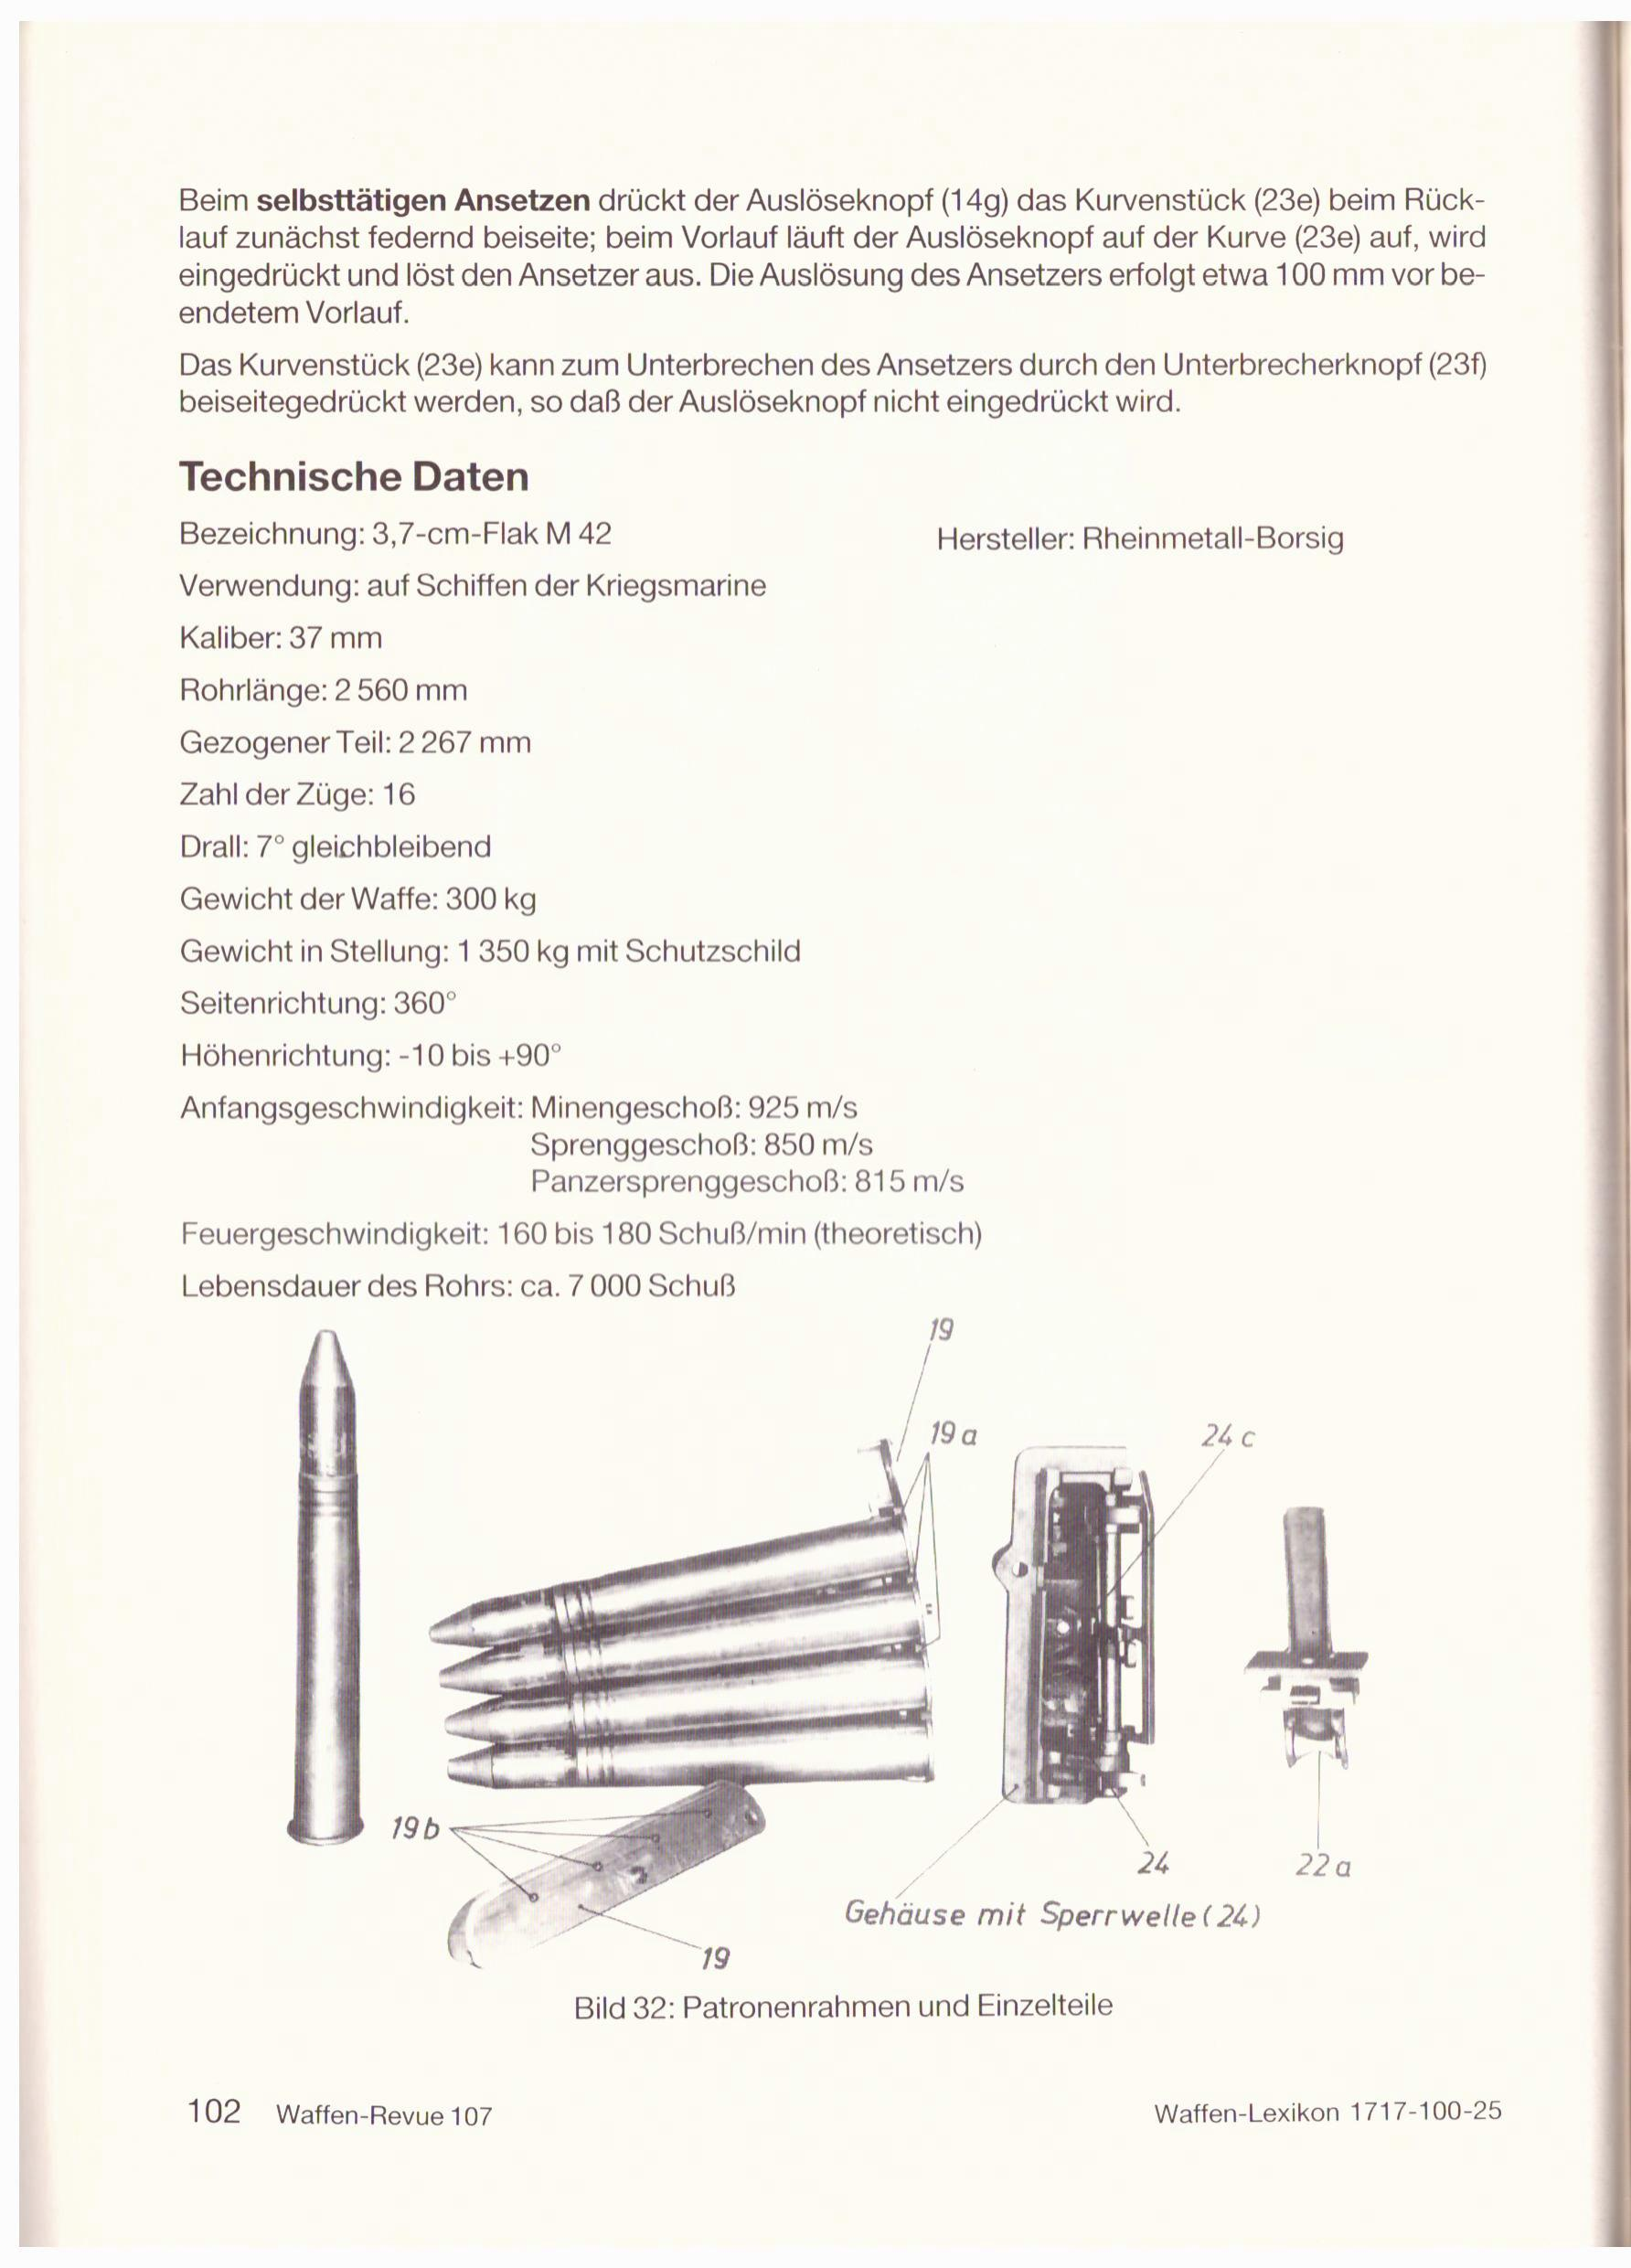 Waffen Revue 107_03.jpg